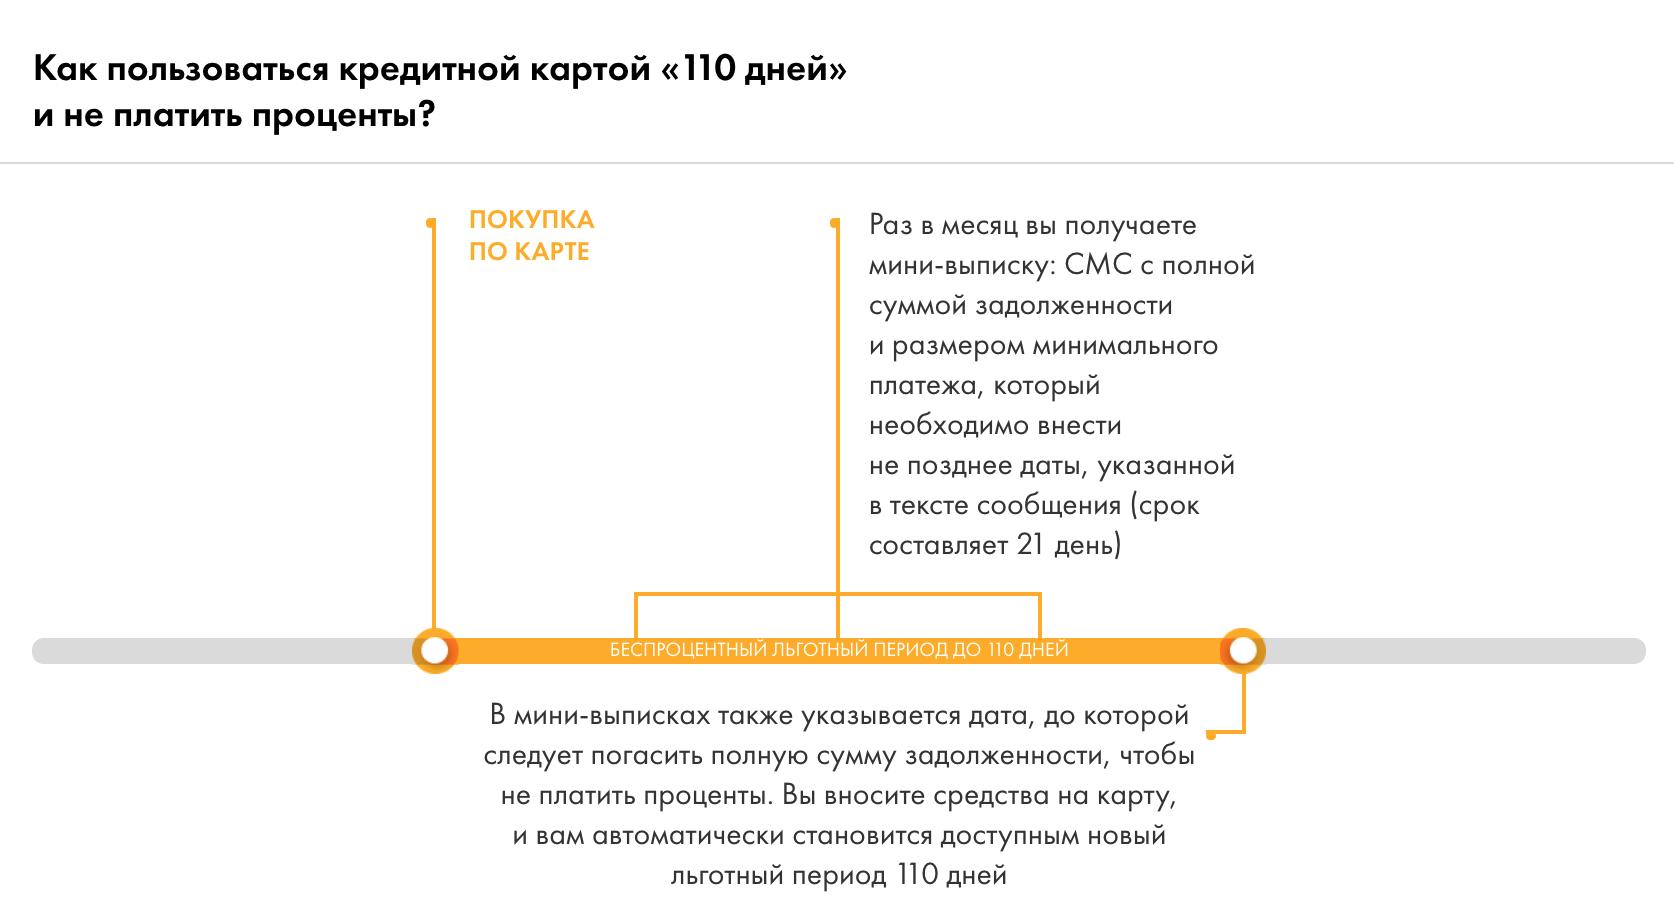 карта райффайзен 110 дней отзывы